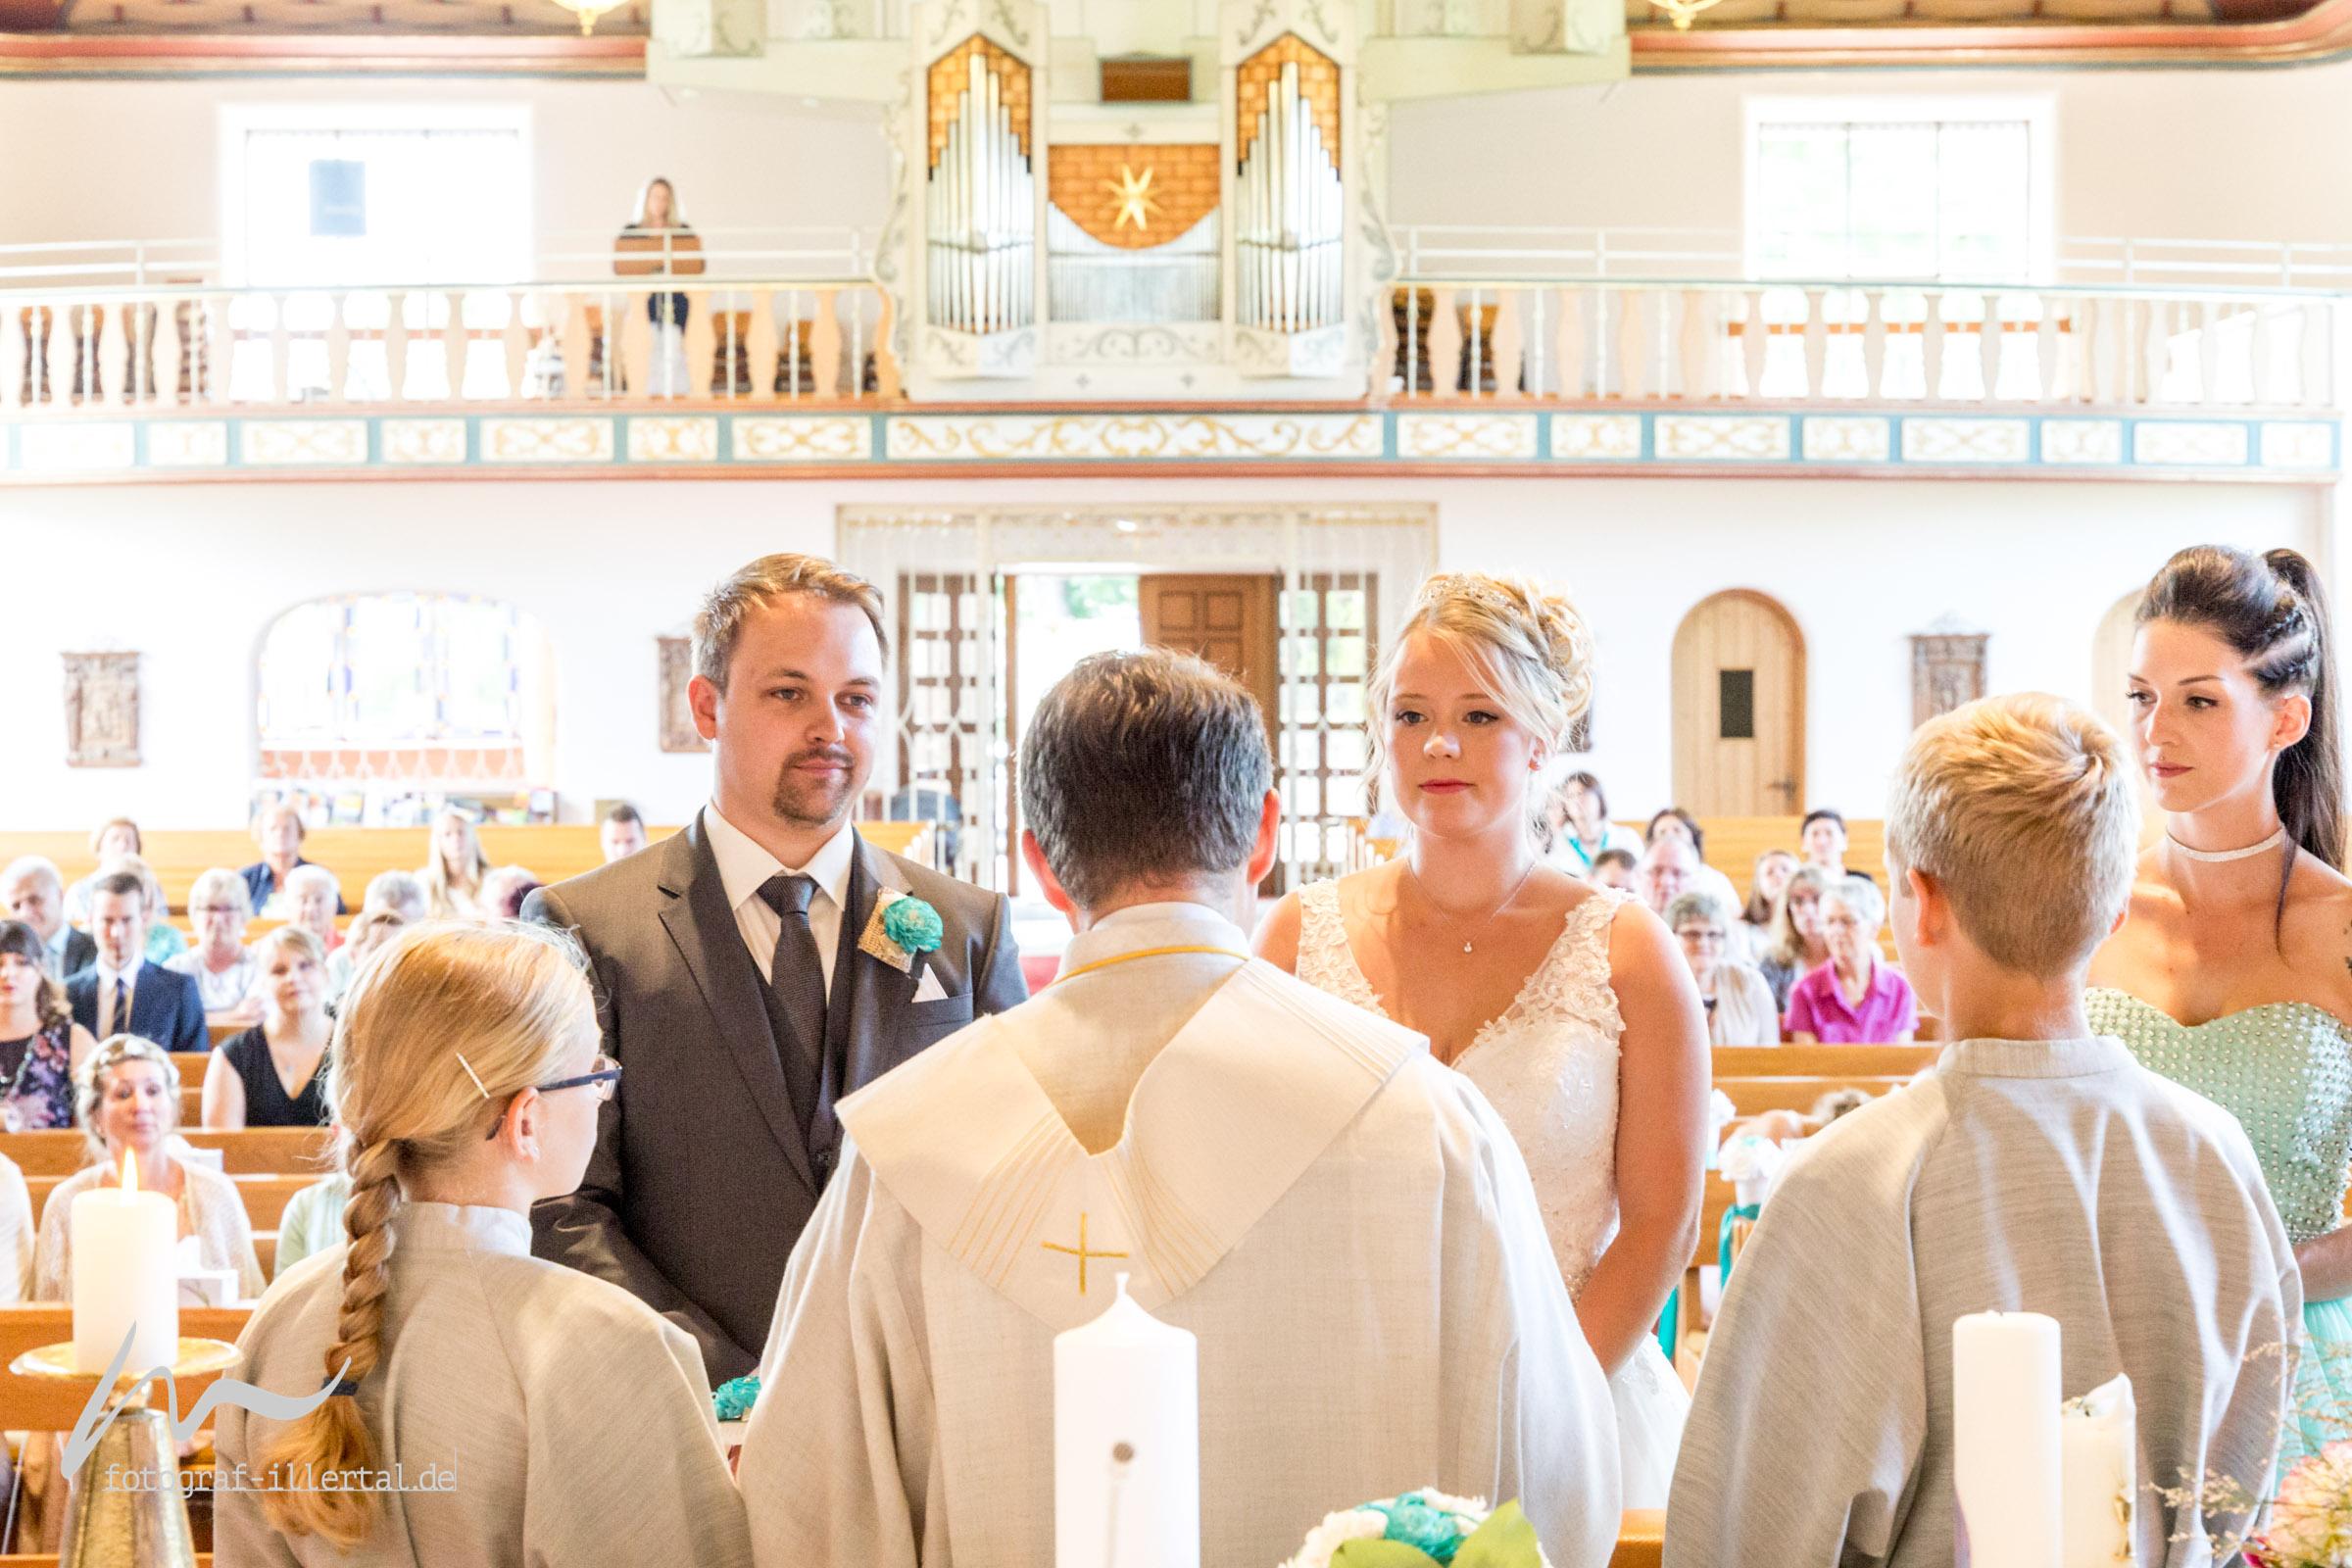 Fotograf Illertal-Christian Miller-Hochzeitsfotografie-_MG_5772